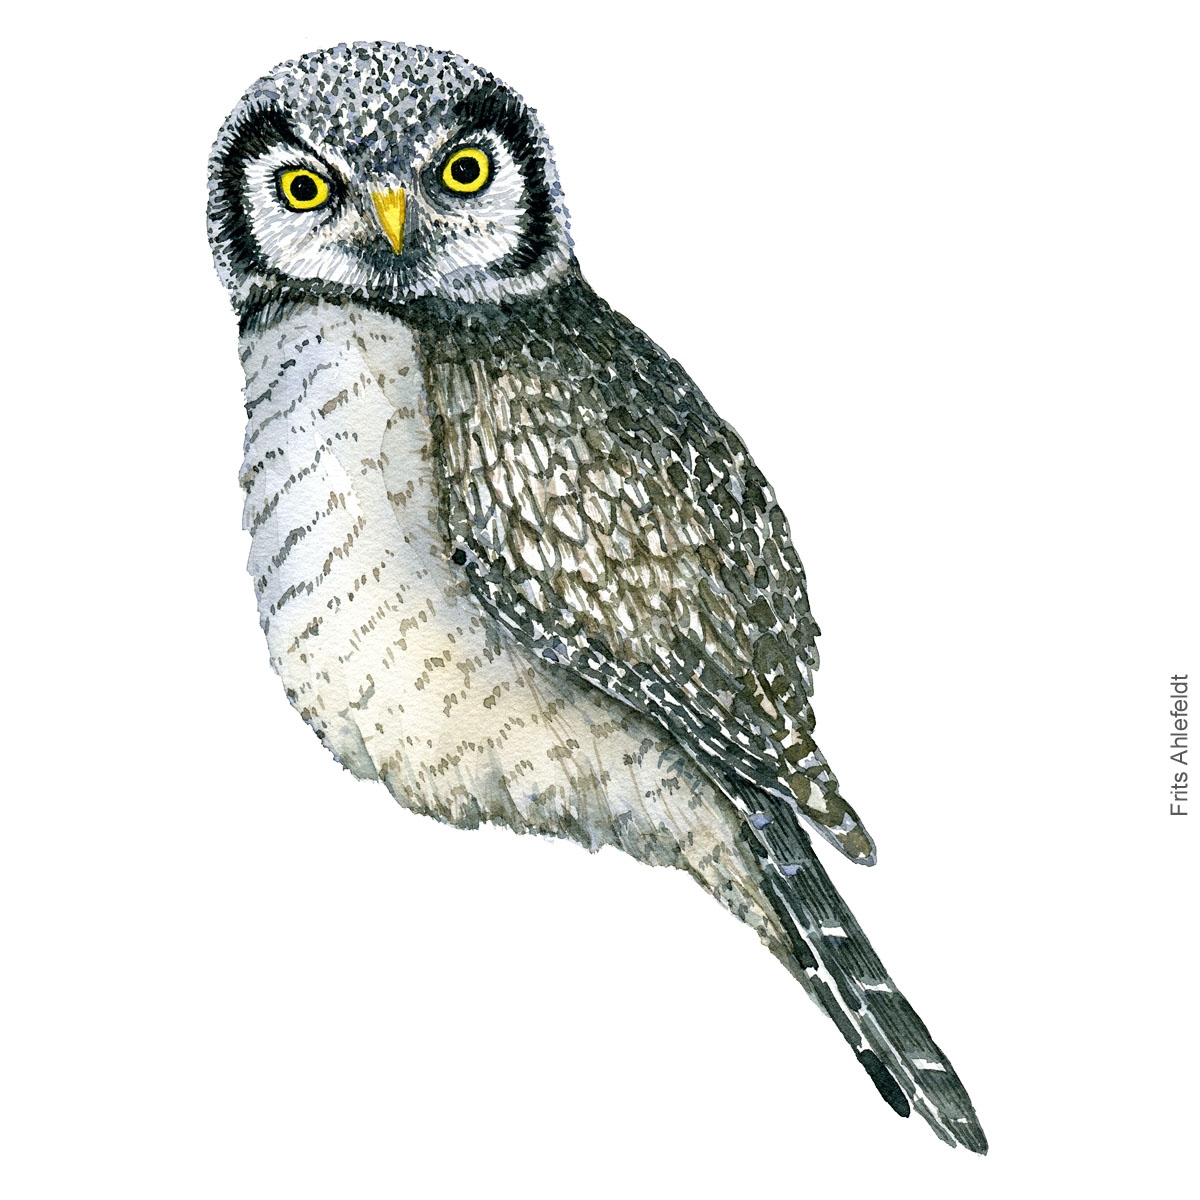 Northern hawk owl - Hoegeugle Akvarel. Watercolor bird illustration by Frits Ahlefeldt